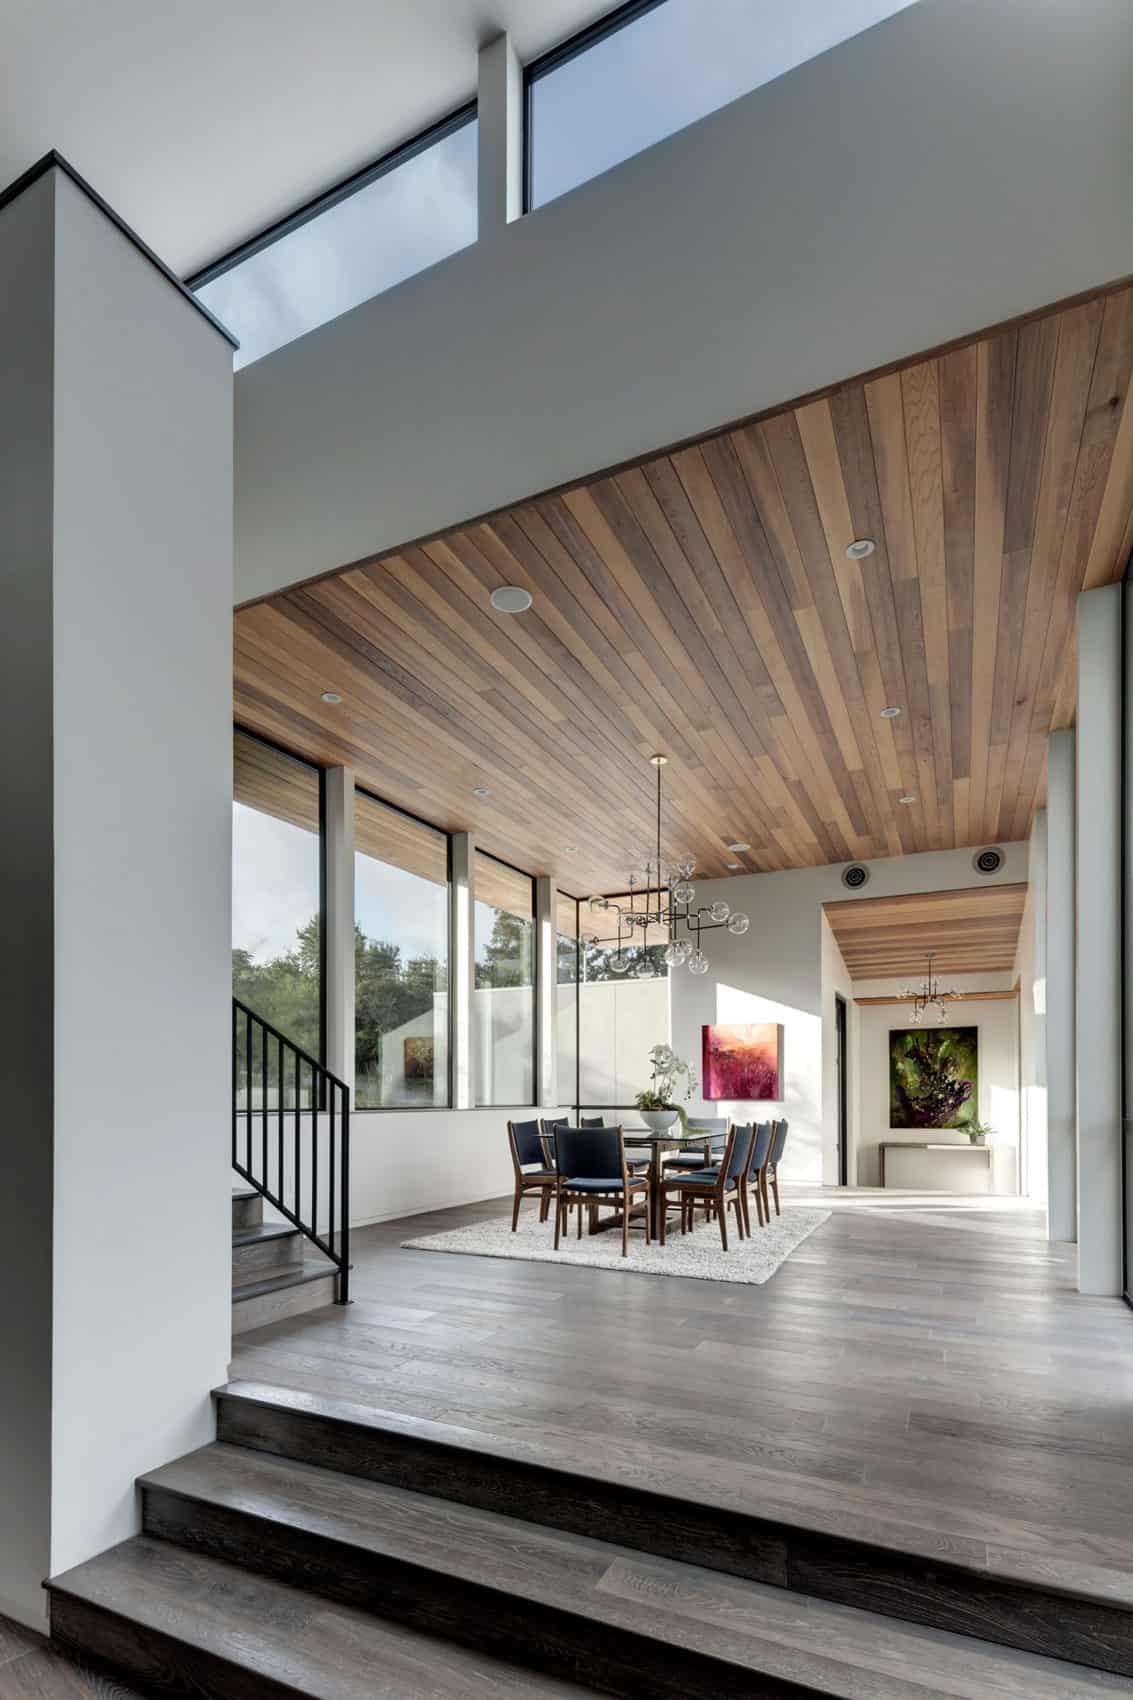 [Bracketed Space] House by Matt Fajkus Architecture (11)